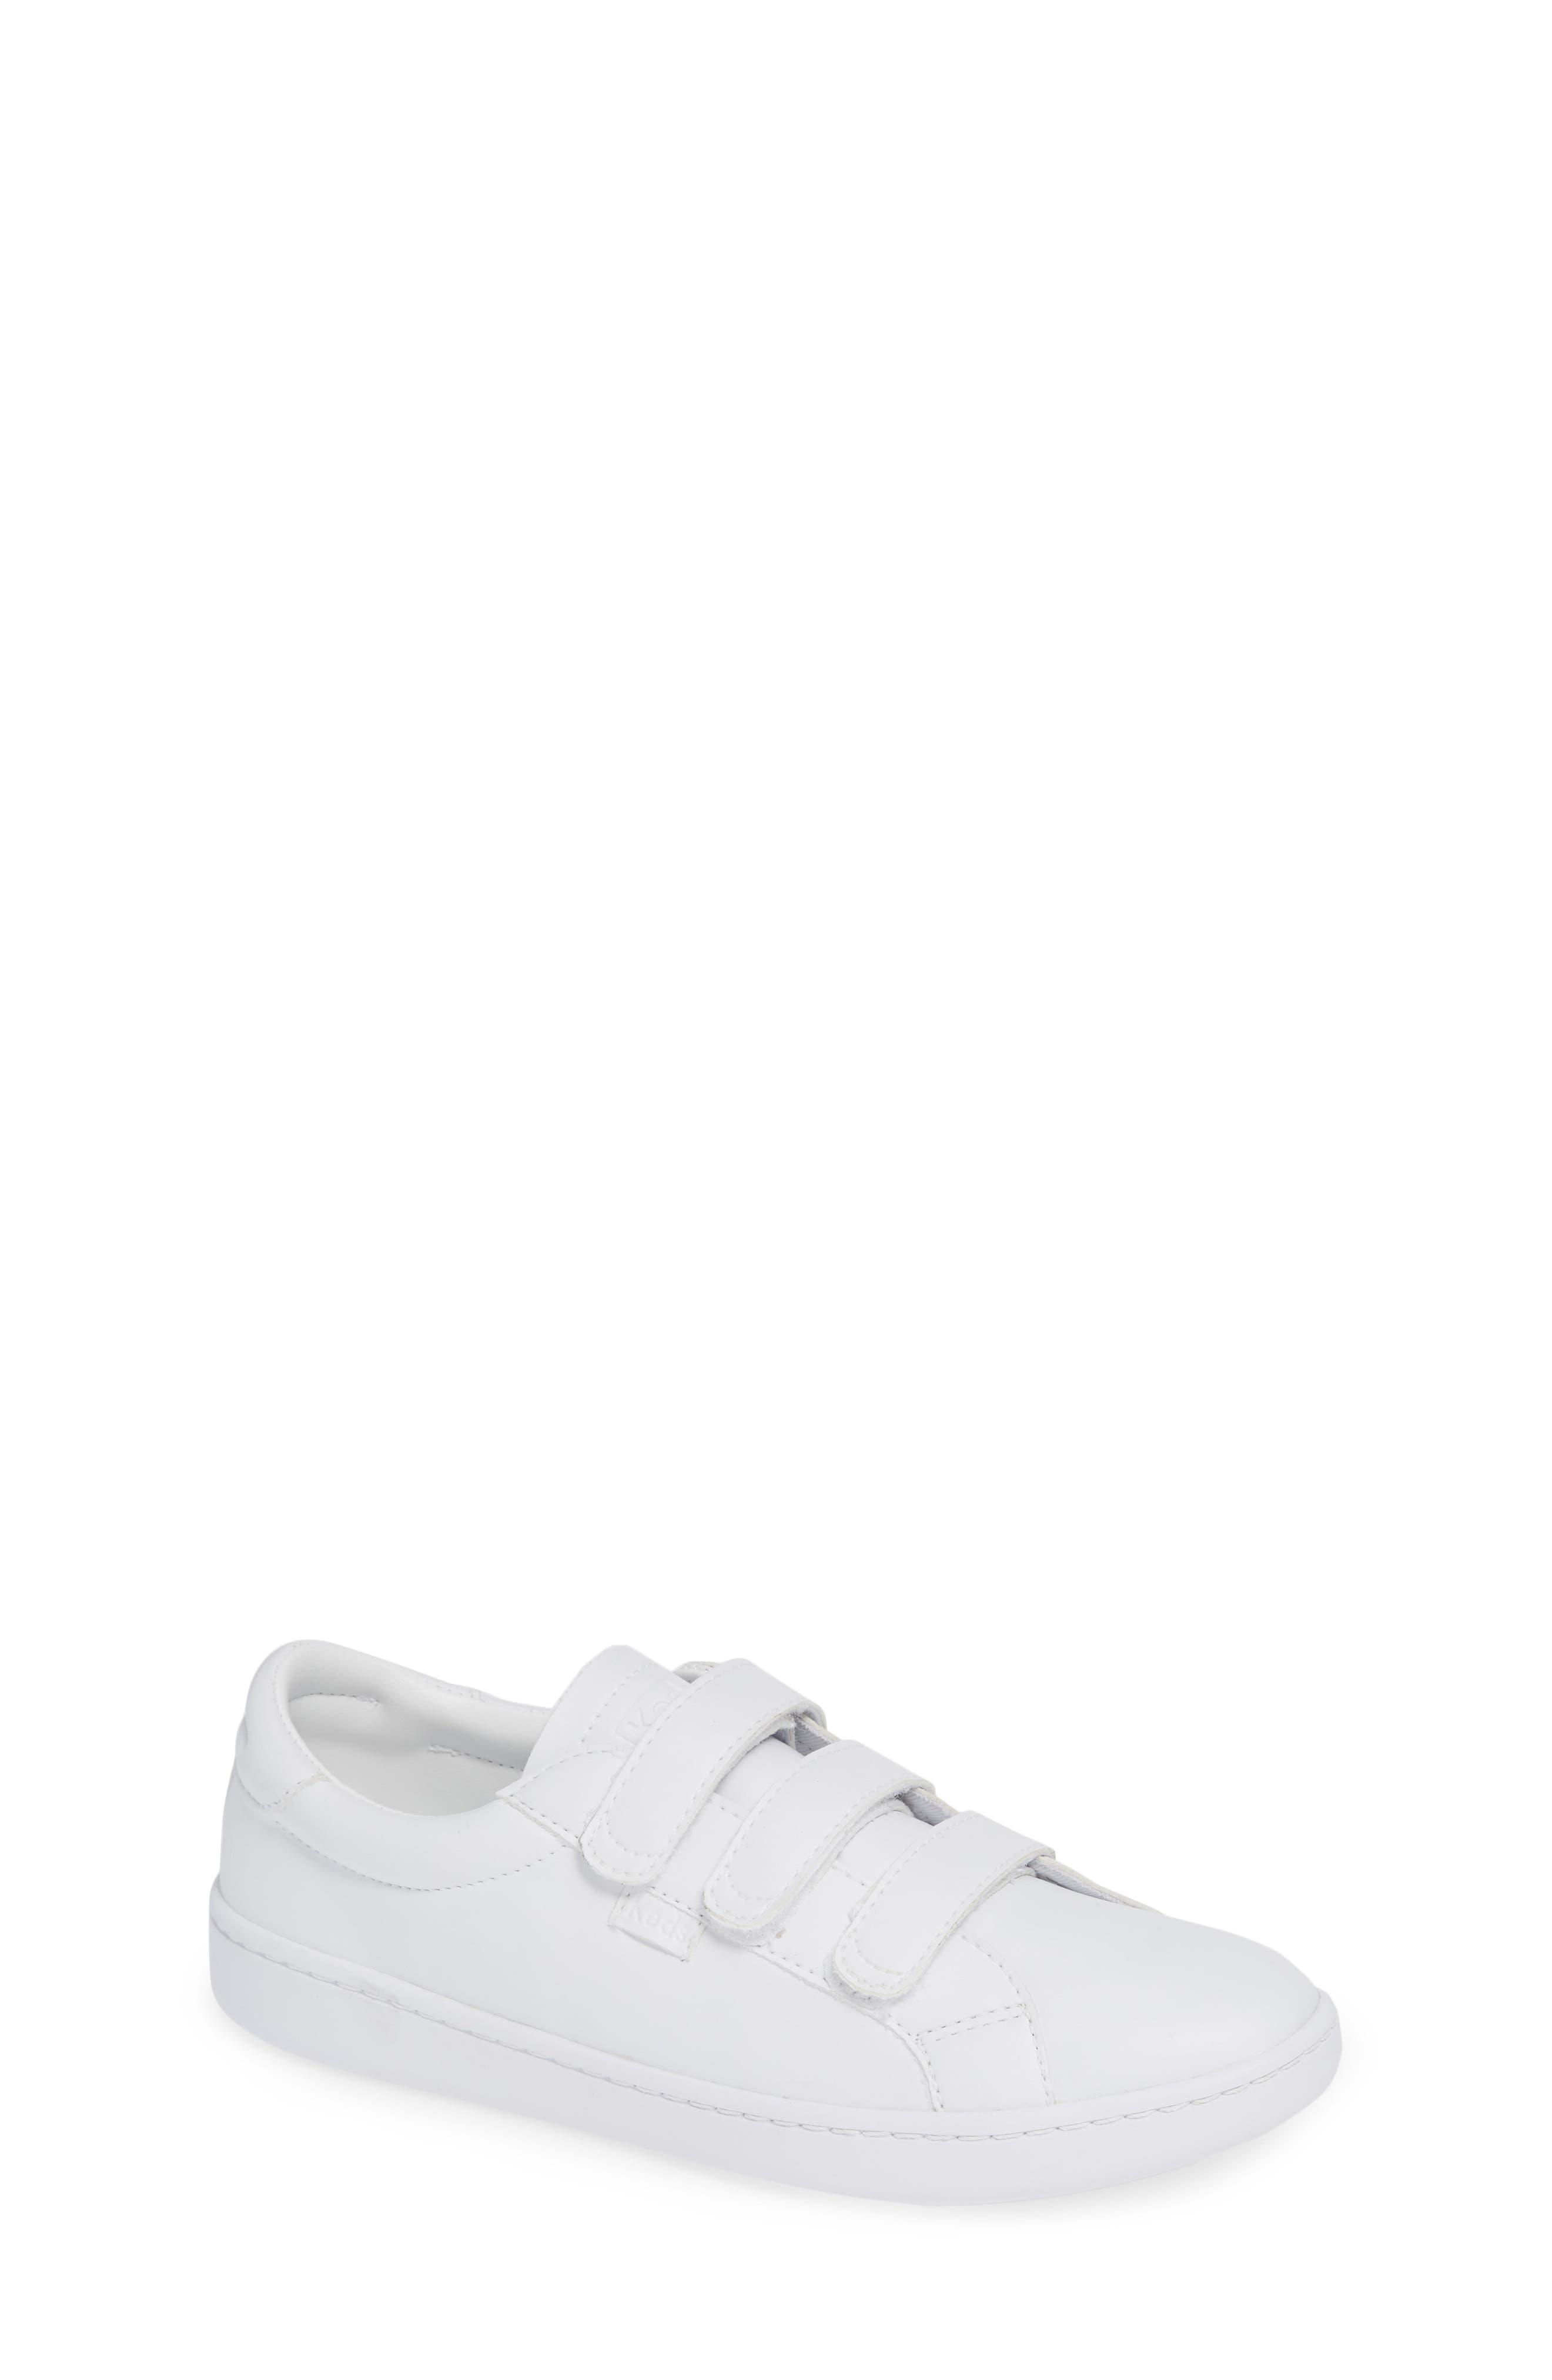 KEDS<SUP>®</SUP> Ace 3V Sneaker, Main, color, 100